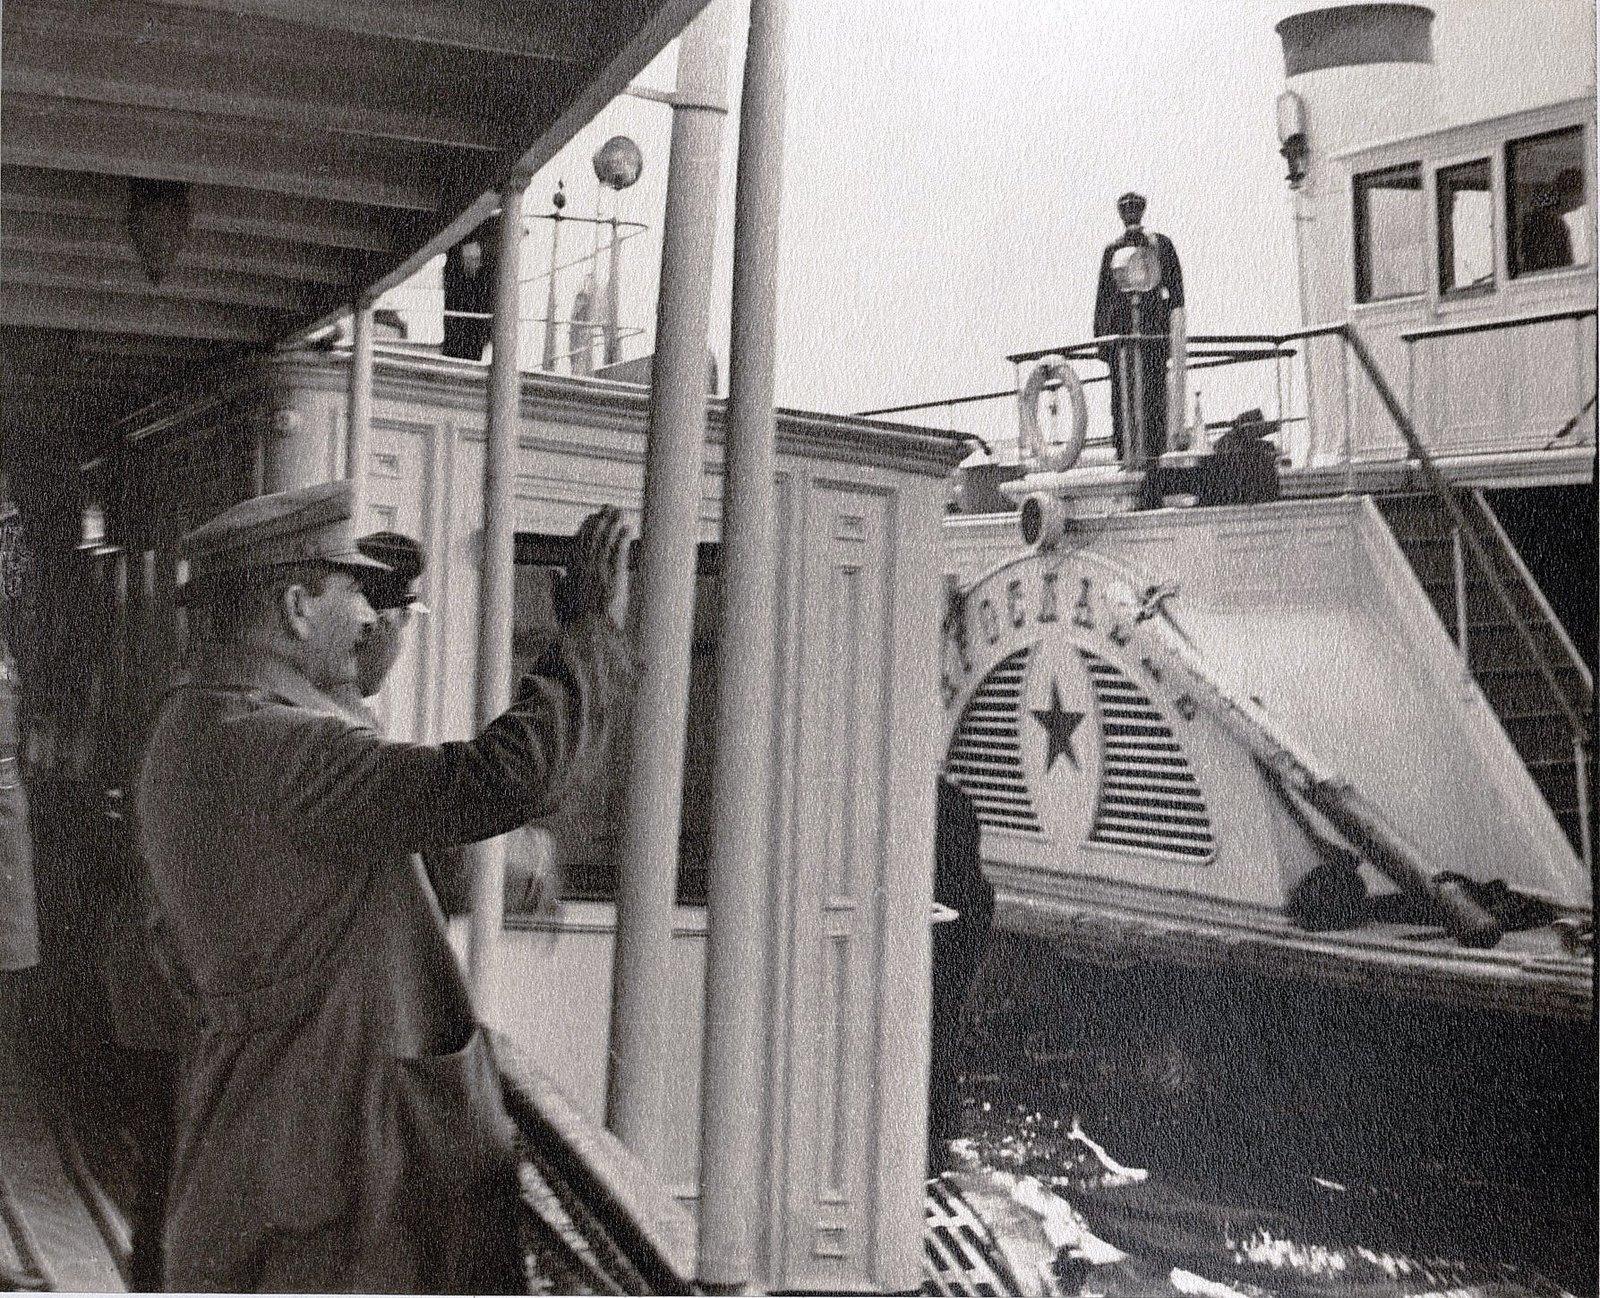 18. И.В. Сталин и К.Е. Ворошилов. Теплоход Клара Цеткин. Август 1933